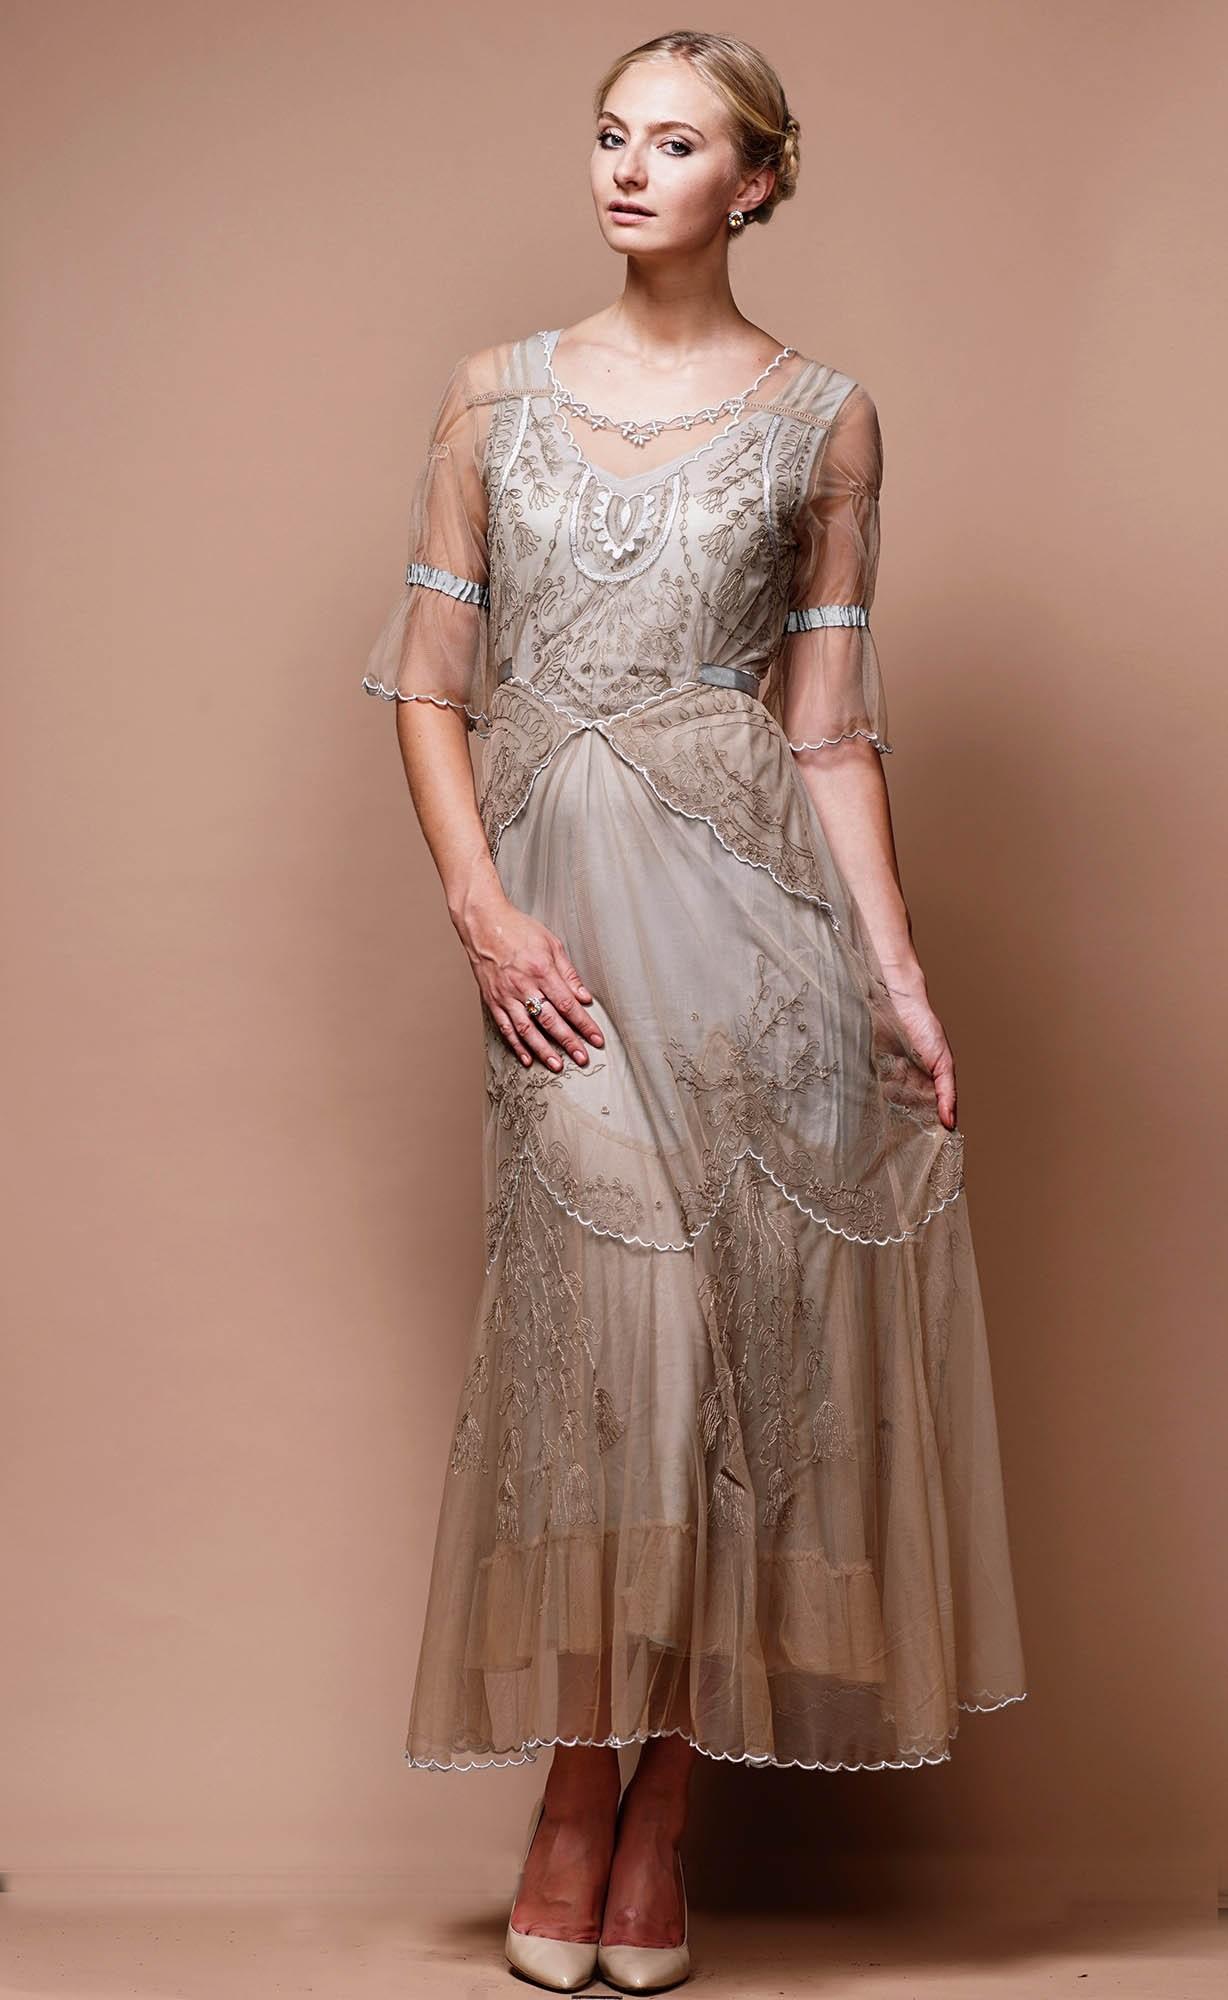 Edwardian Vintage Inspired Wedding Dress in Sand-Silver by Nataya